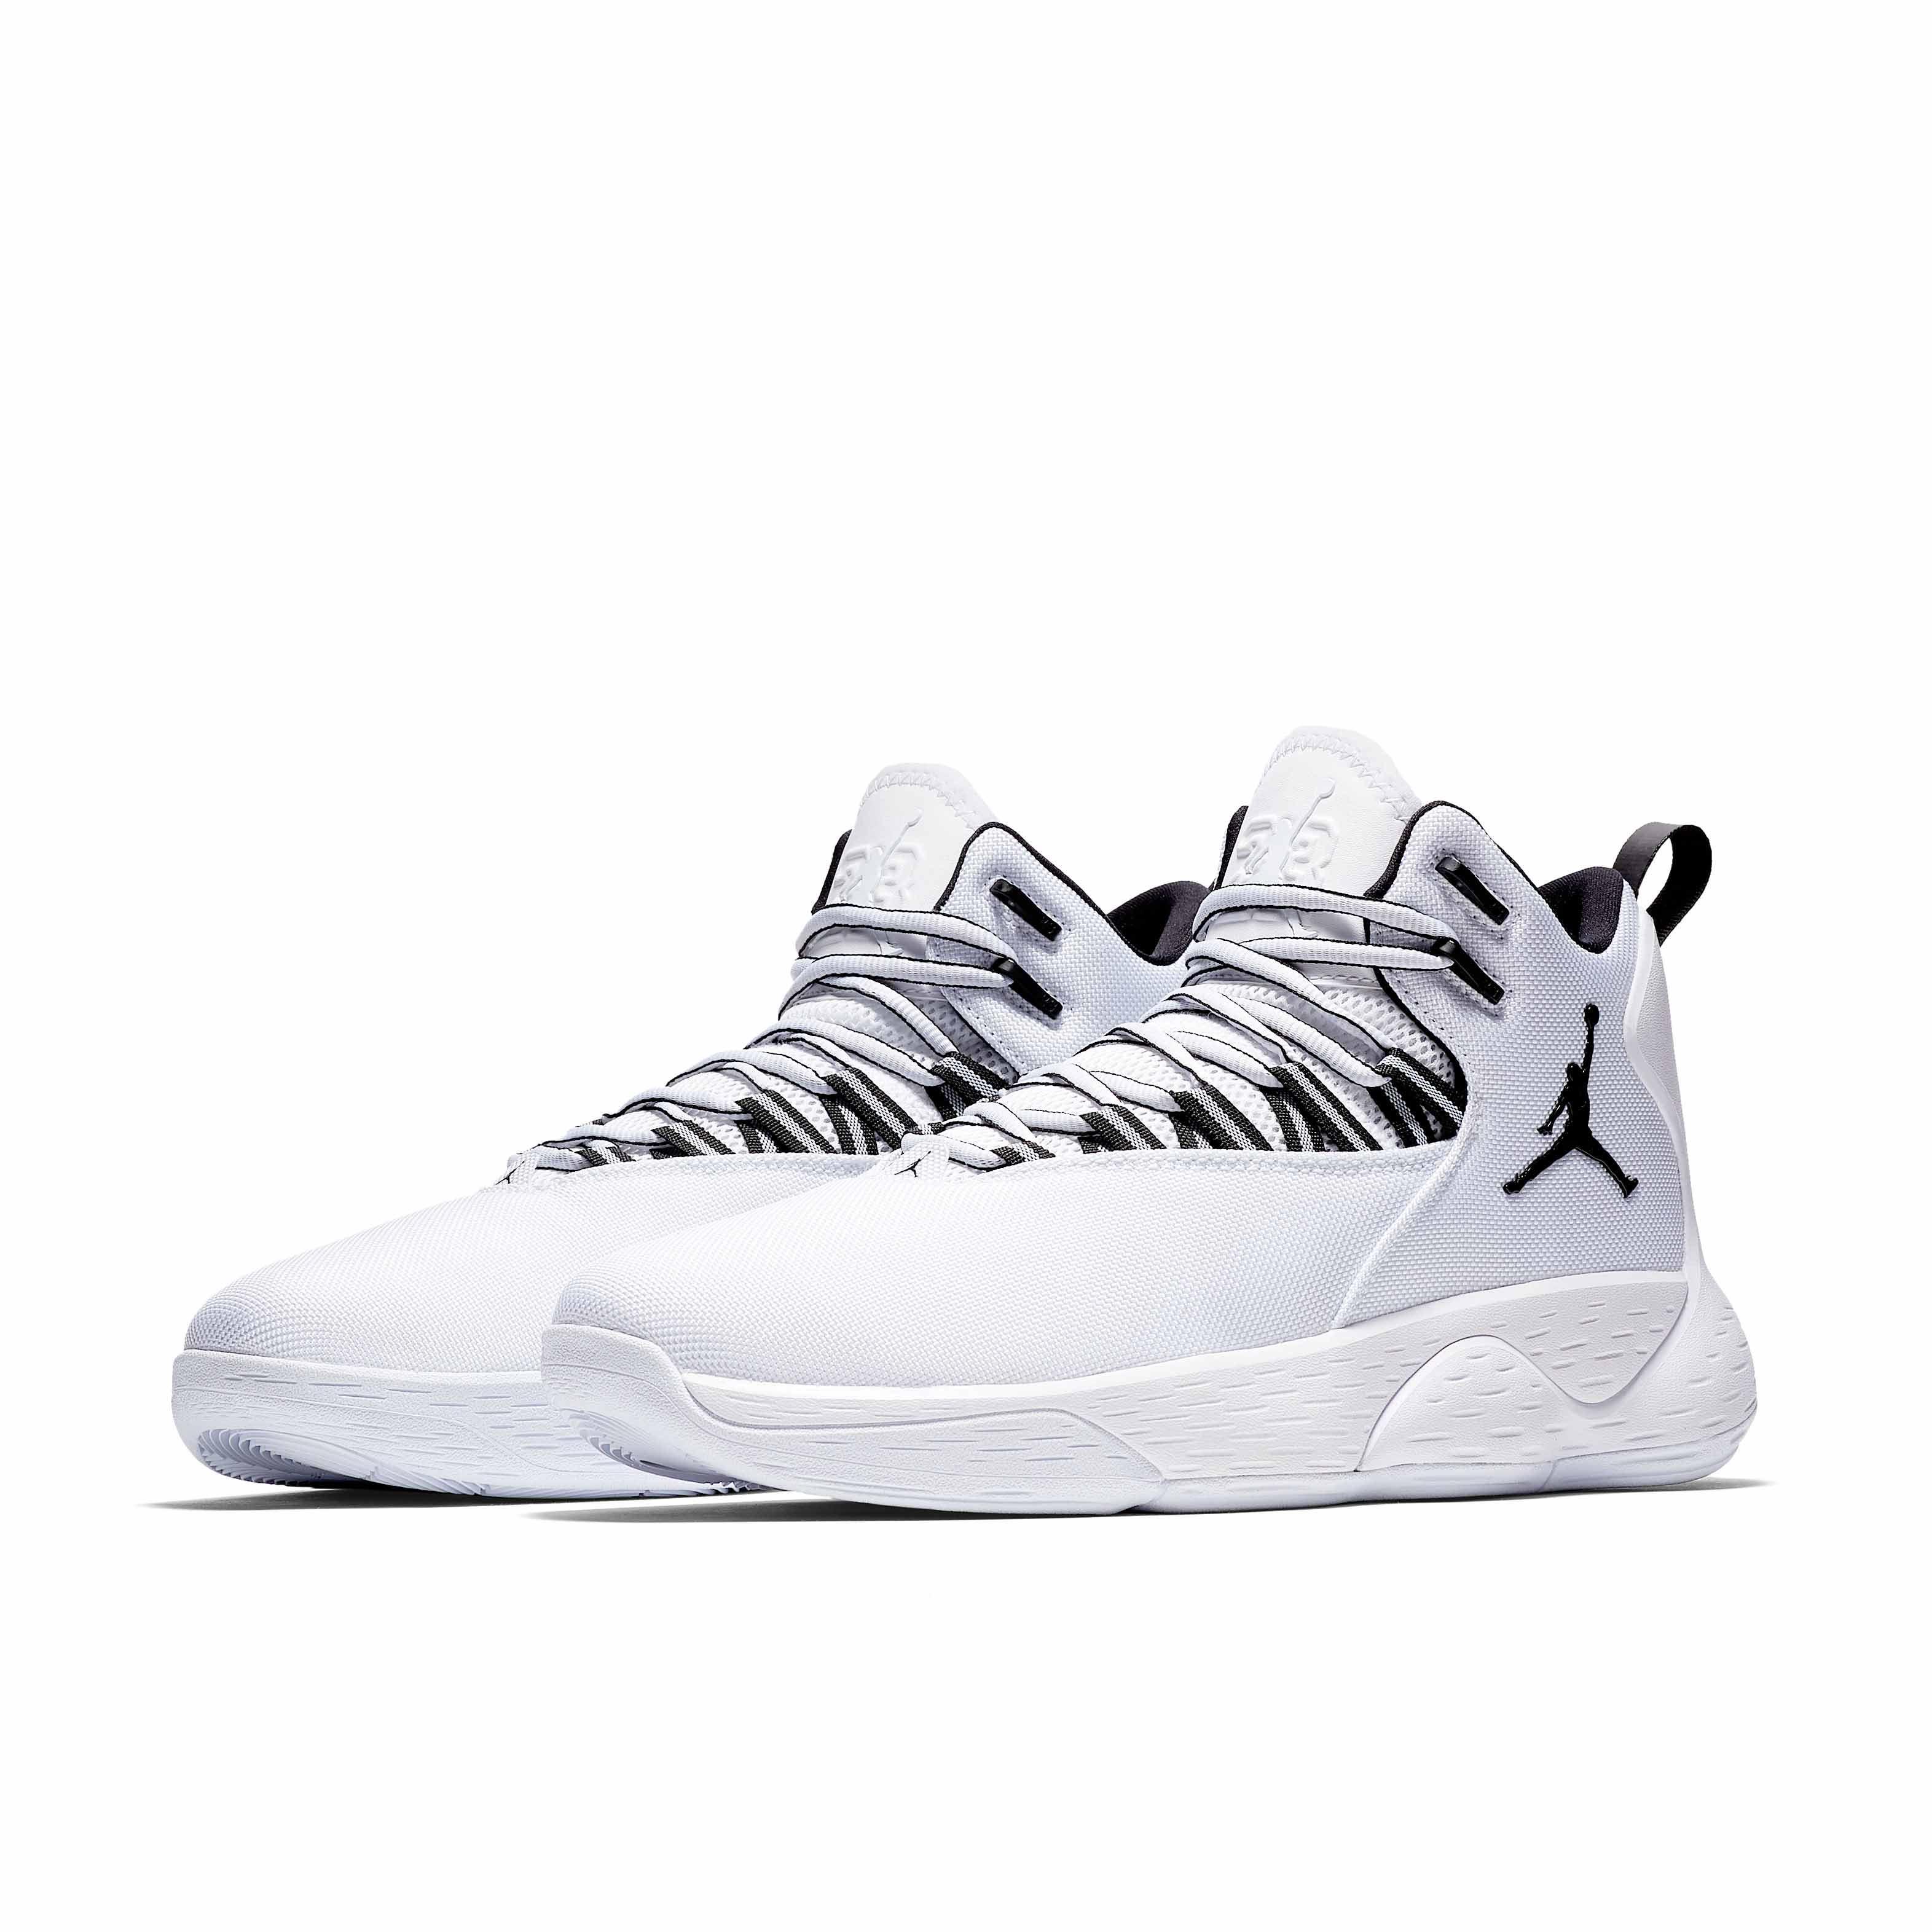 Jordan Brand SUPER.FLY MVP PF AR0038男子篮球鞋 (灰、46)